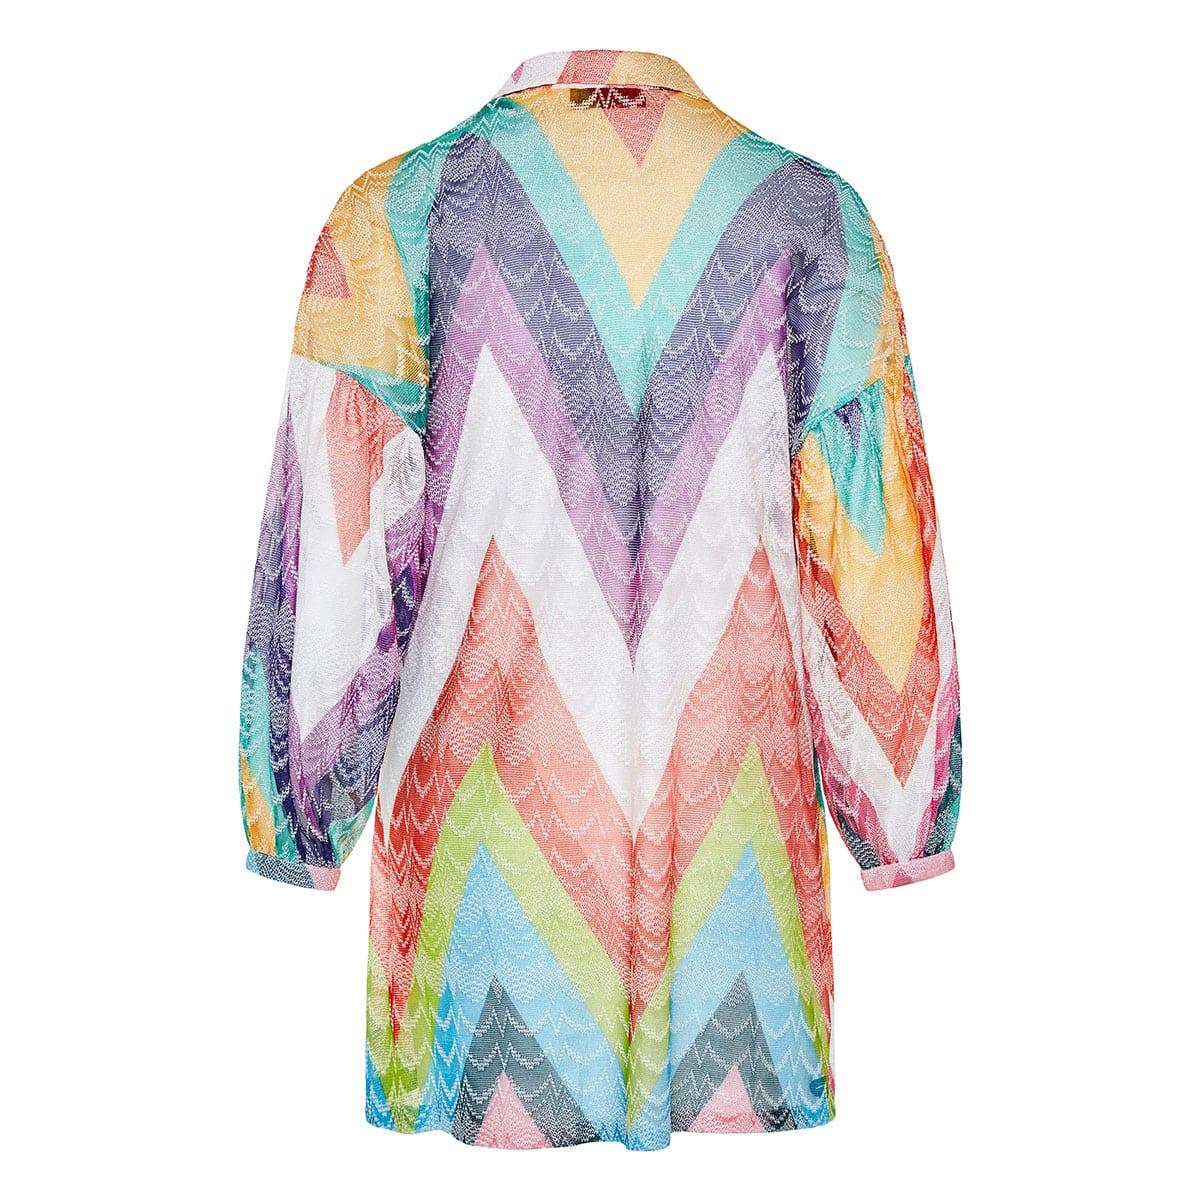 Chevron knitted beach dress